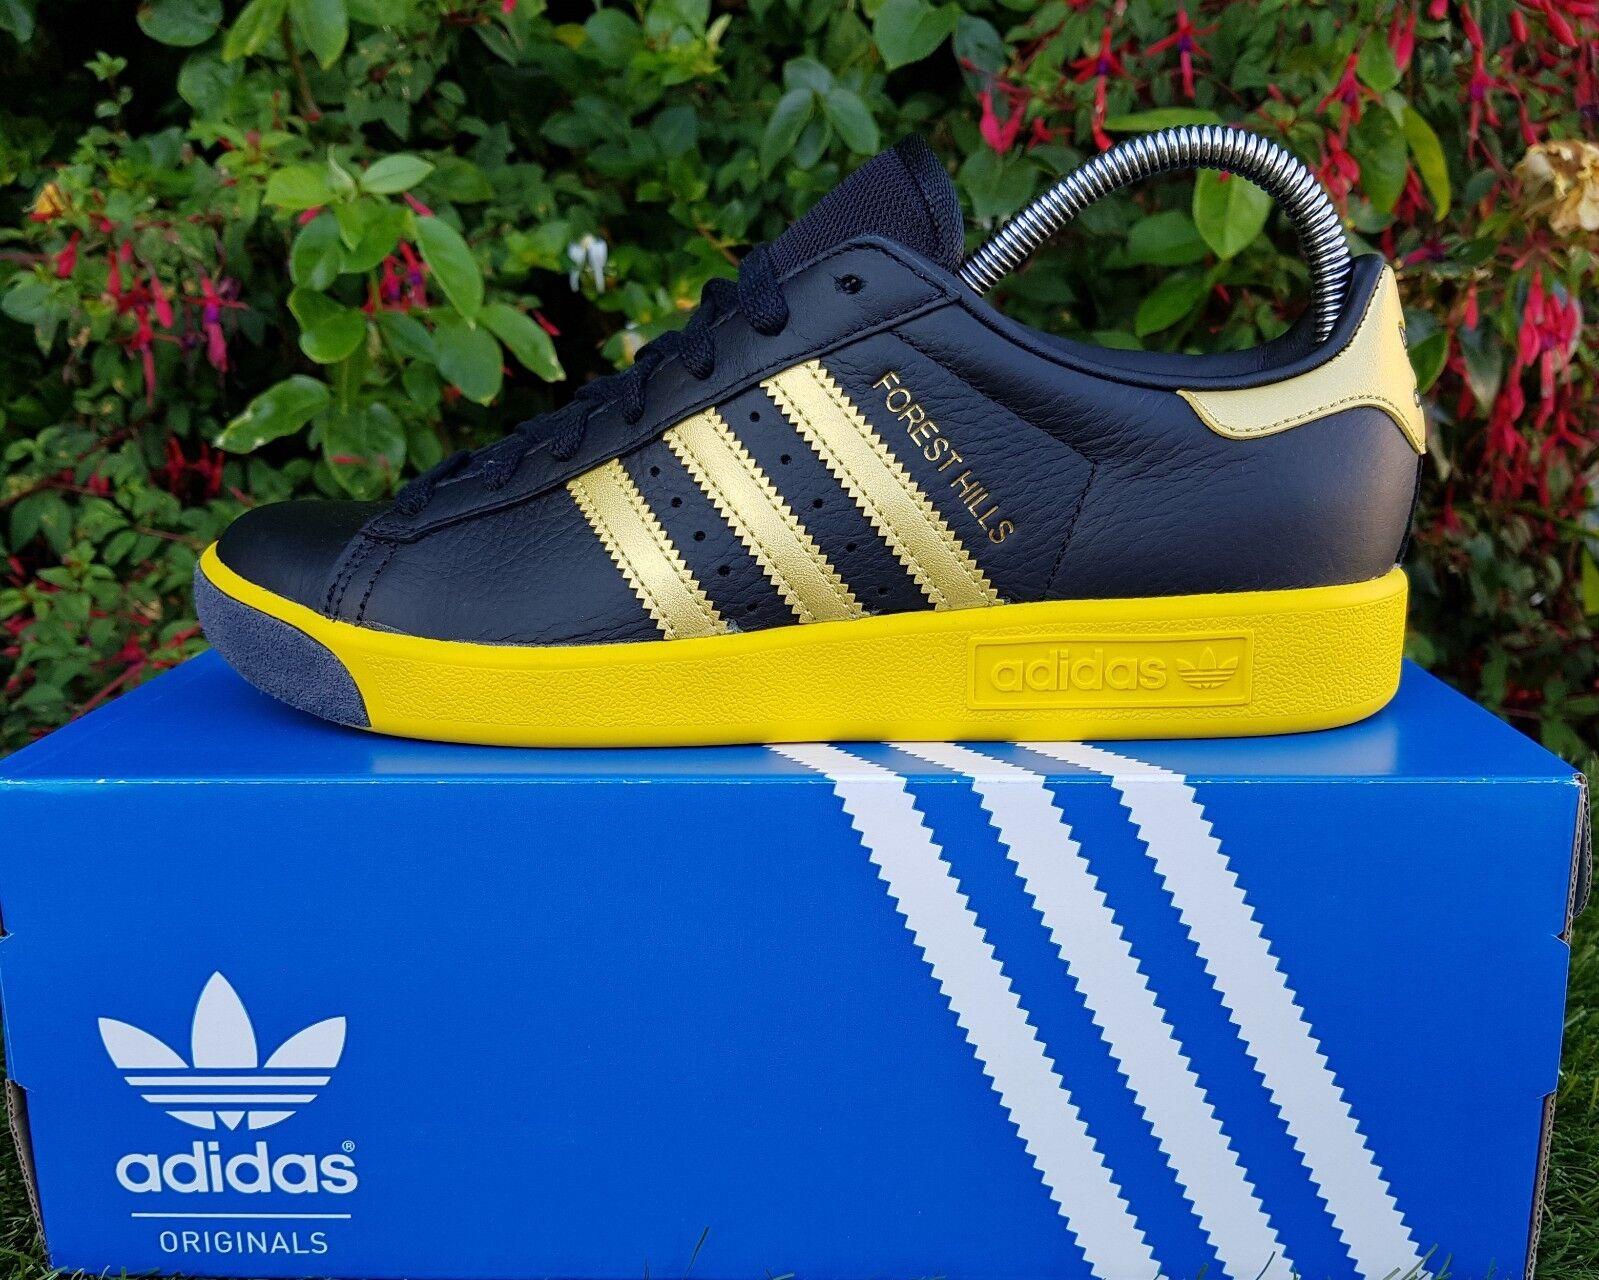 BNWB & Forest Genuine adidas originals ® Forest & Hills Retro Black Trainers UK Size 11 2d6329